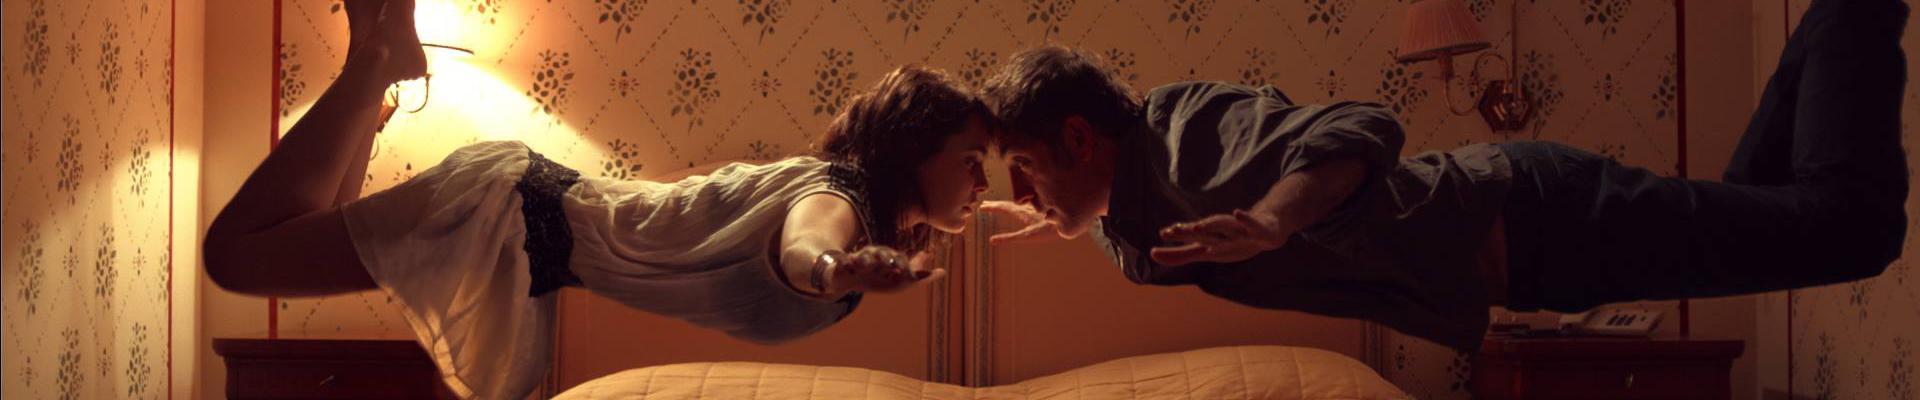 Boring film, but mesmerizing cinematography by Vladan Radovic